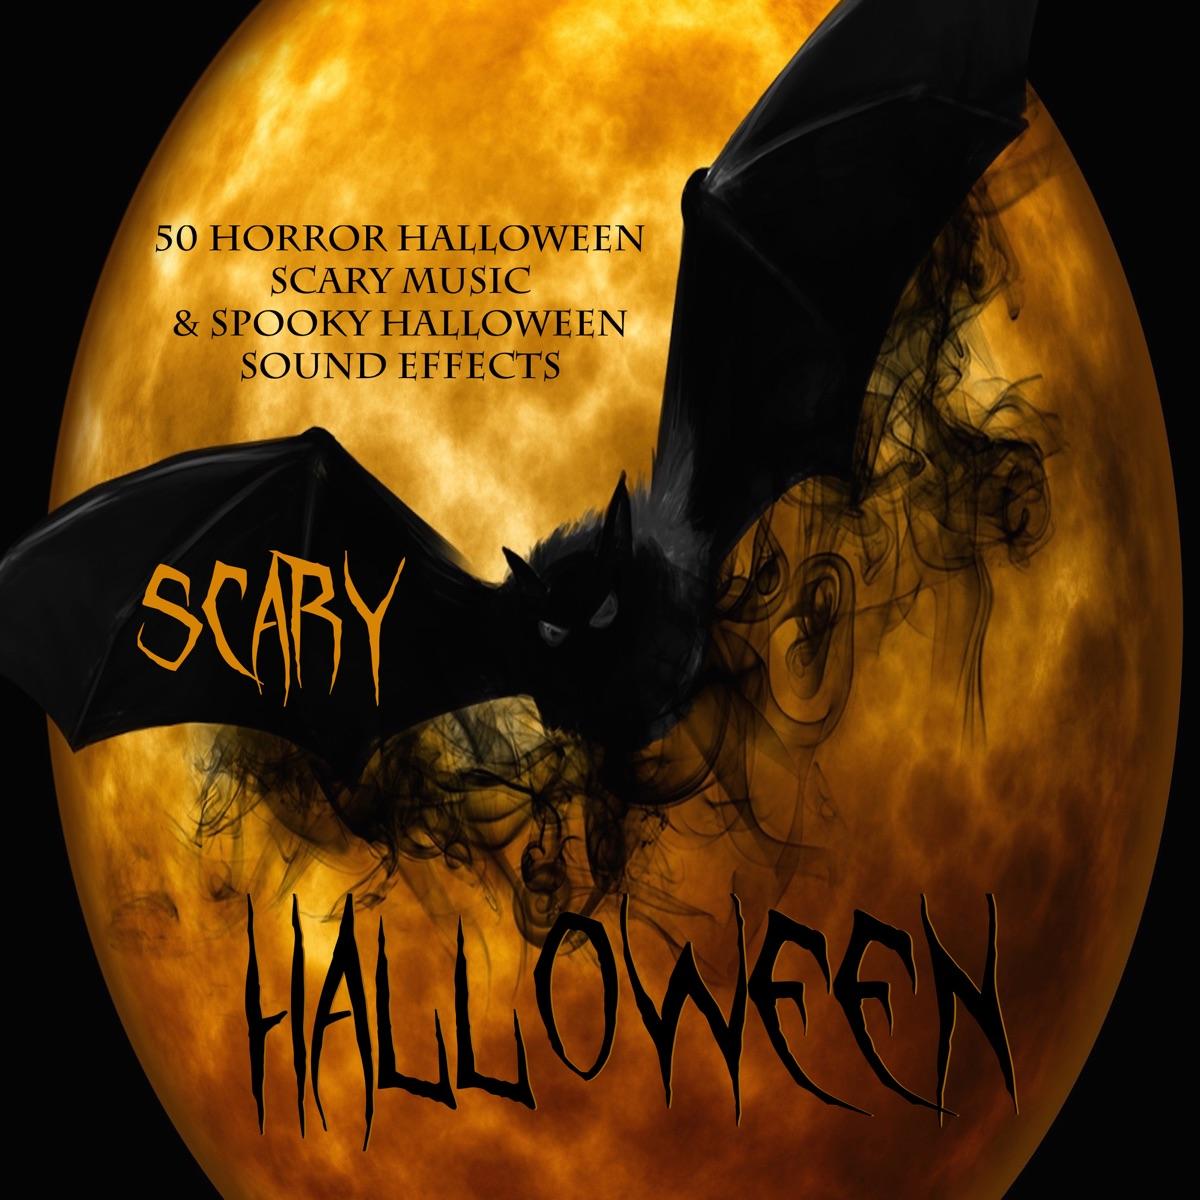 Scary Halloween - 50 Horror Halloween Scary Music & Spooky